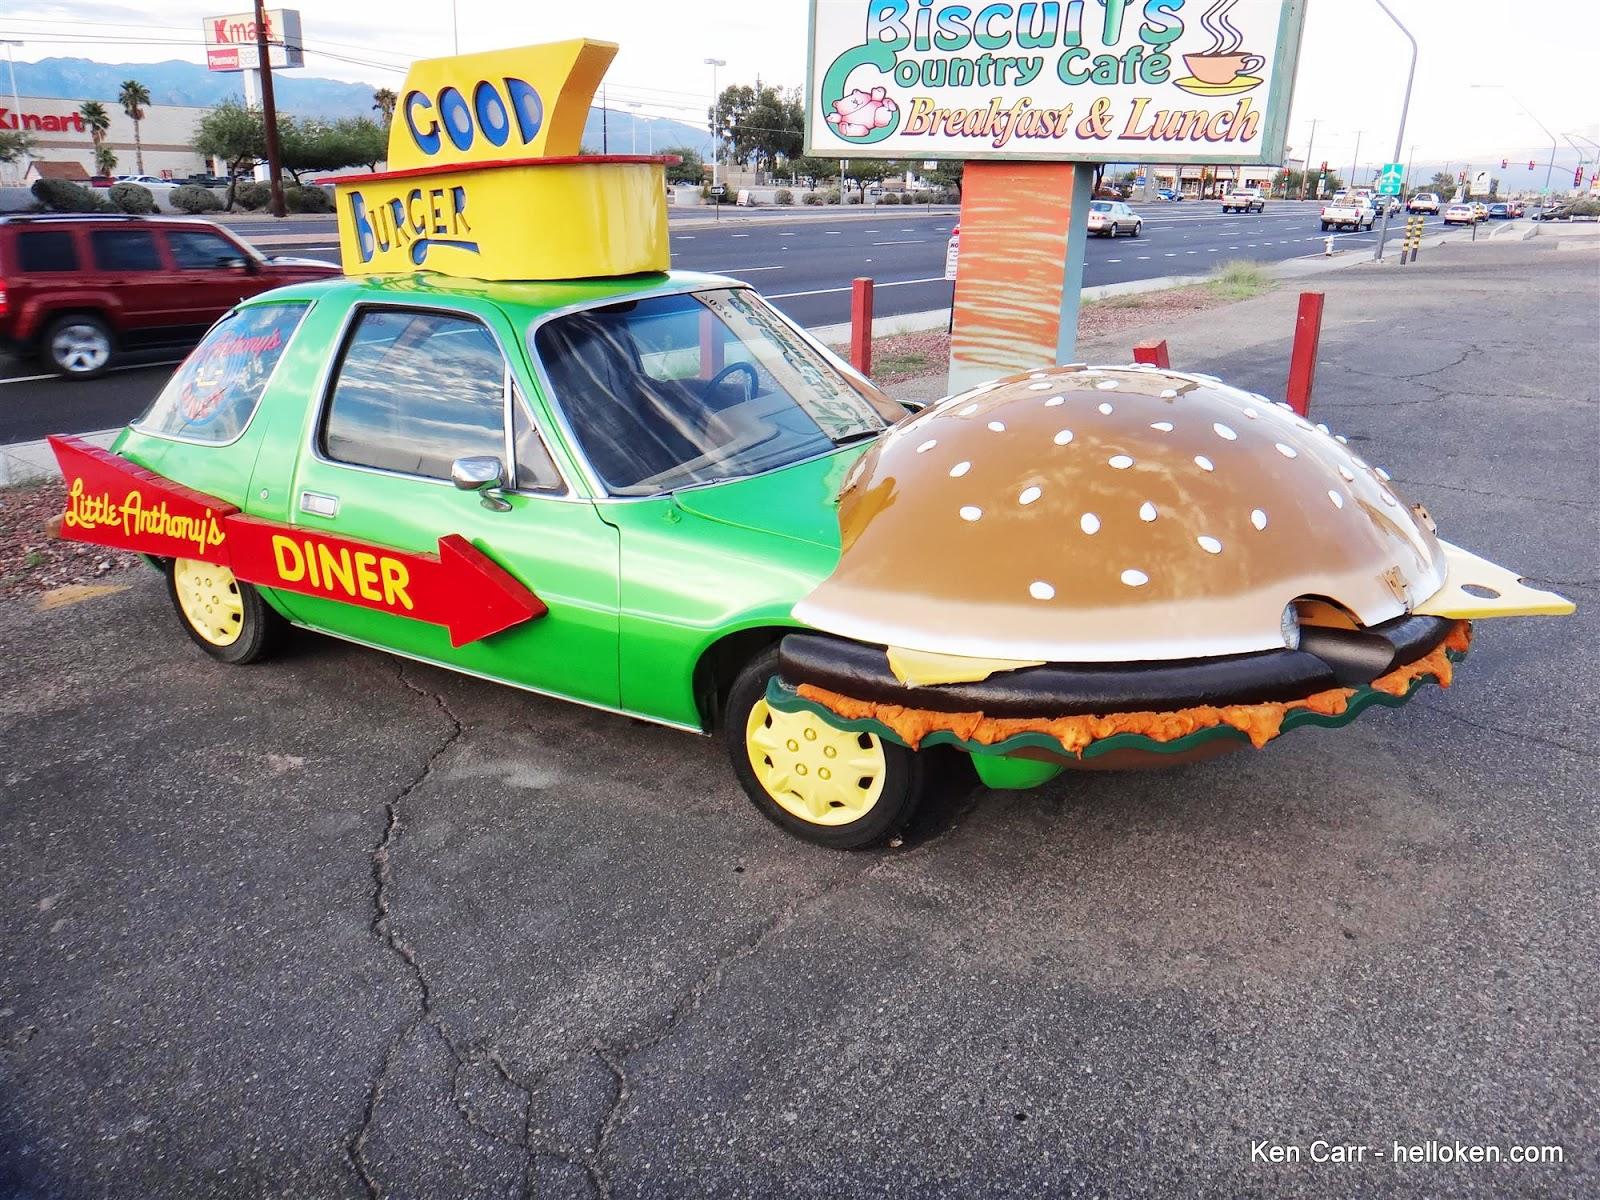 Ken Carr Blog A Green Amc Pacer With A Hamburger Hood And